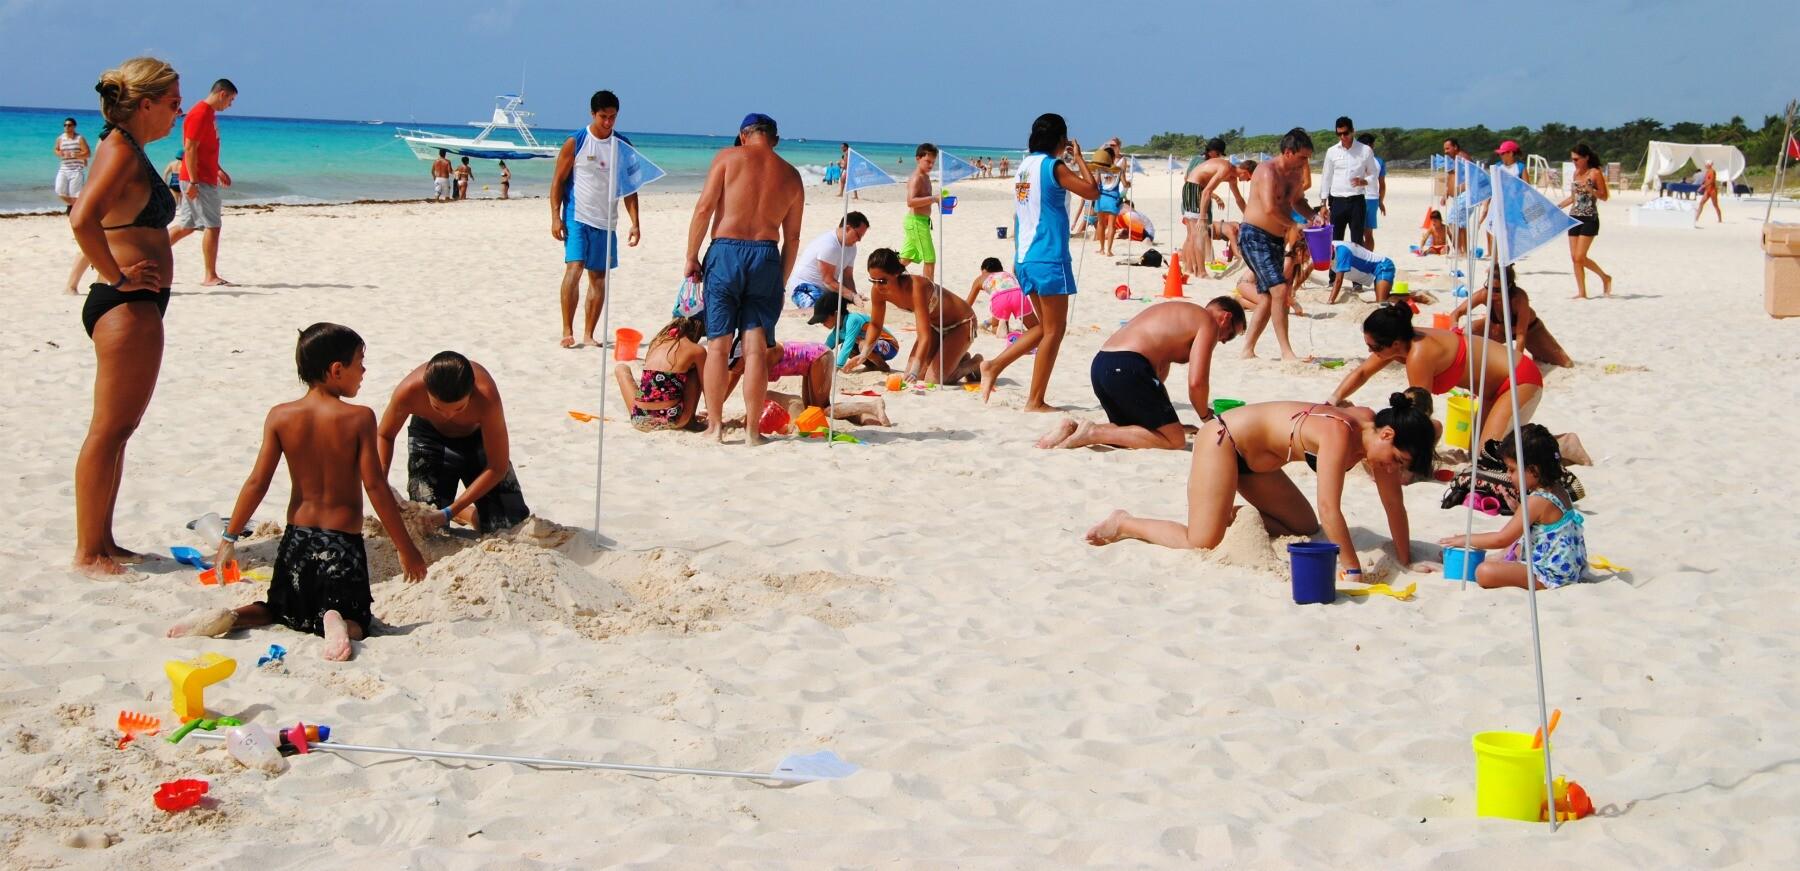 Playa del Carmen sandcastles